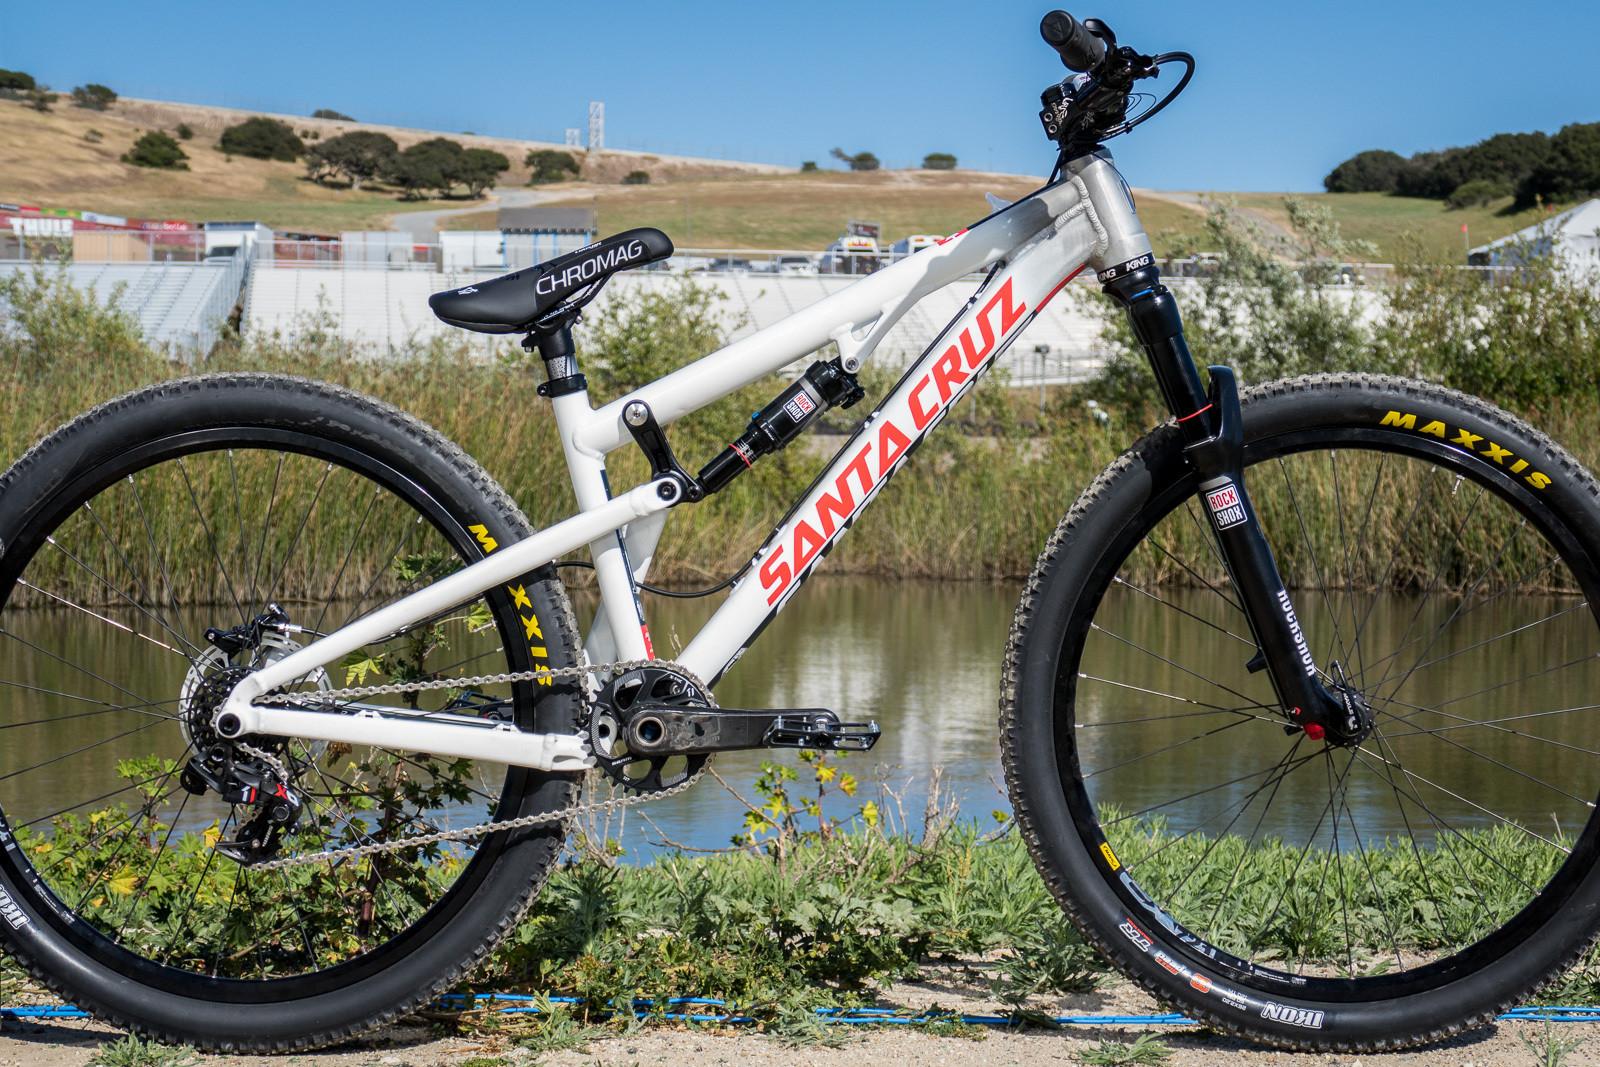 Logan Peat's Prototype Santa Cruz Slopestyle Bike - 2015 Sea Otter Classic Pit Bits - Mountain Biking Pictures - Vital MTB